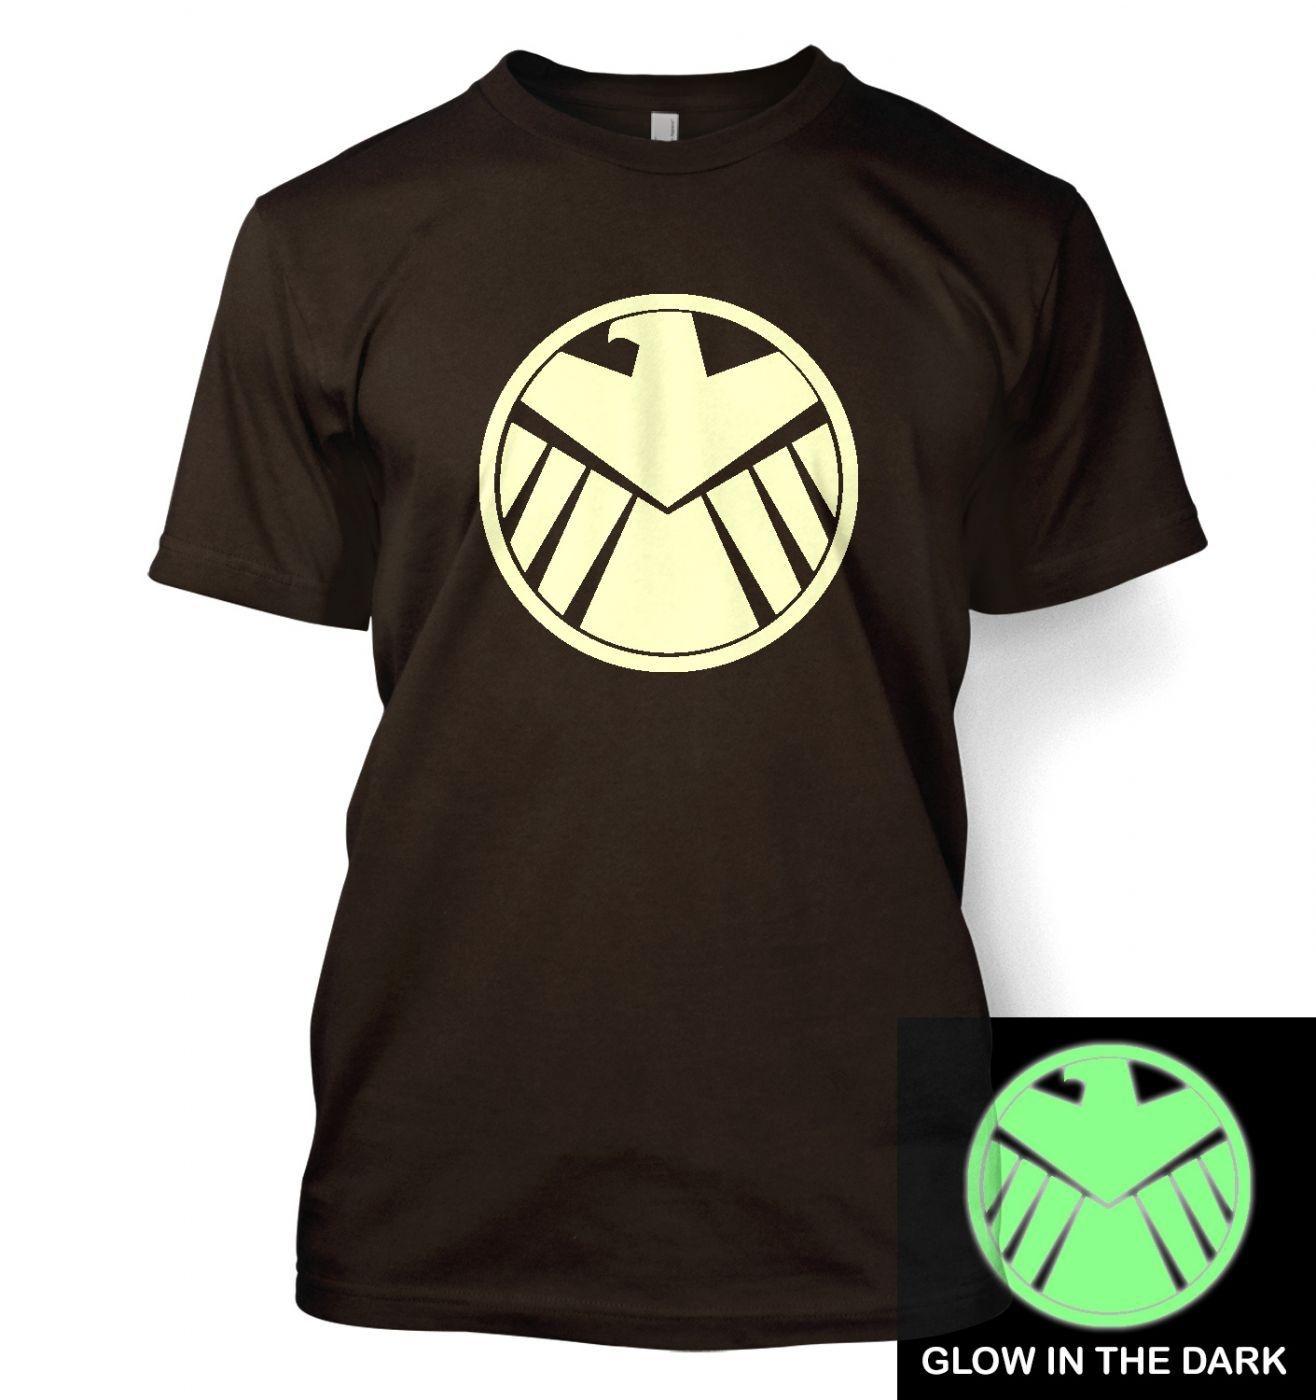 Shield (glow in the dark) t-shirt